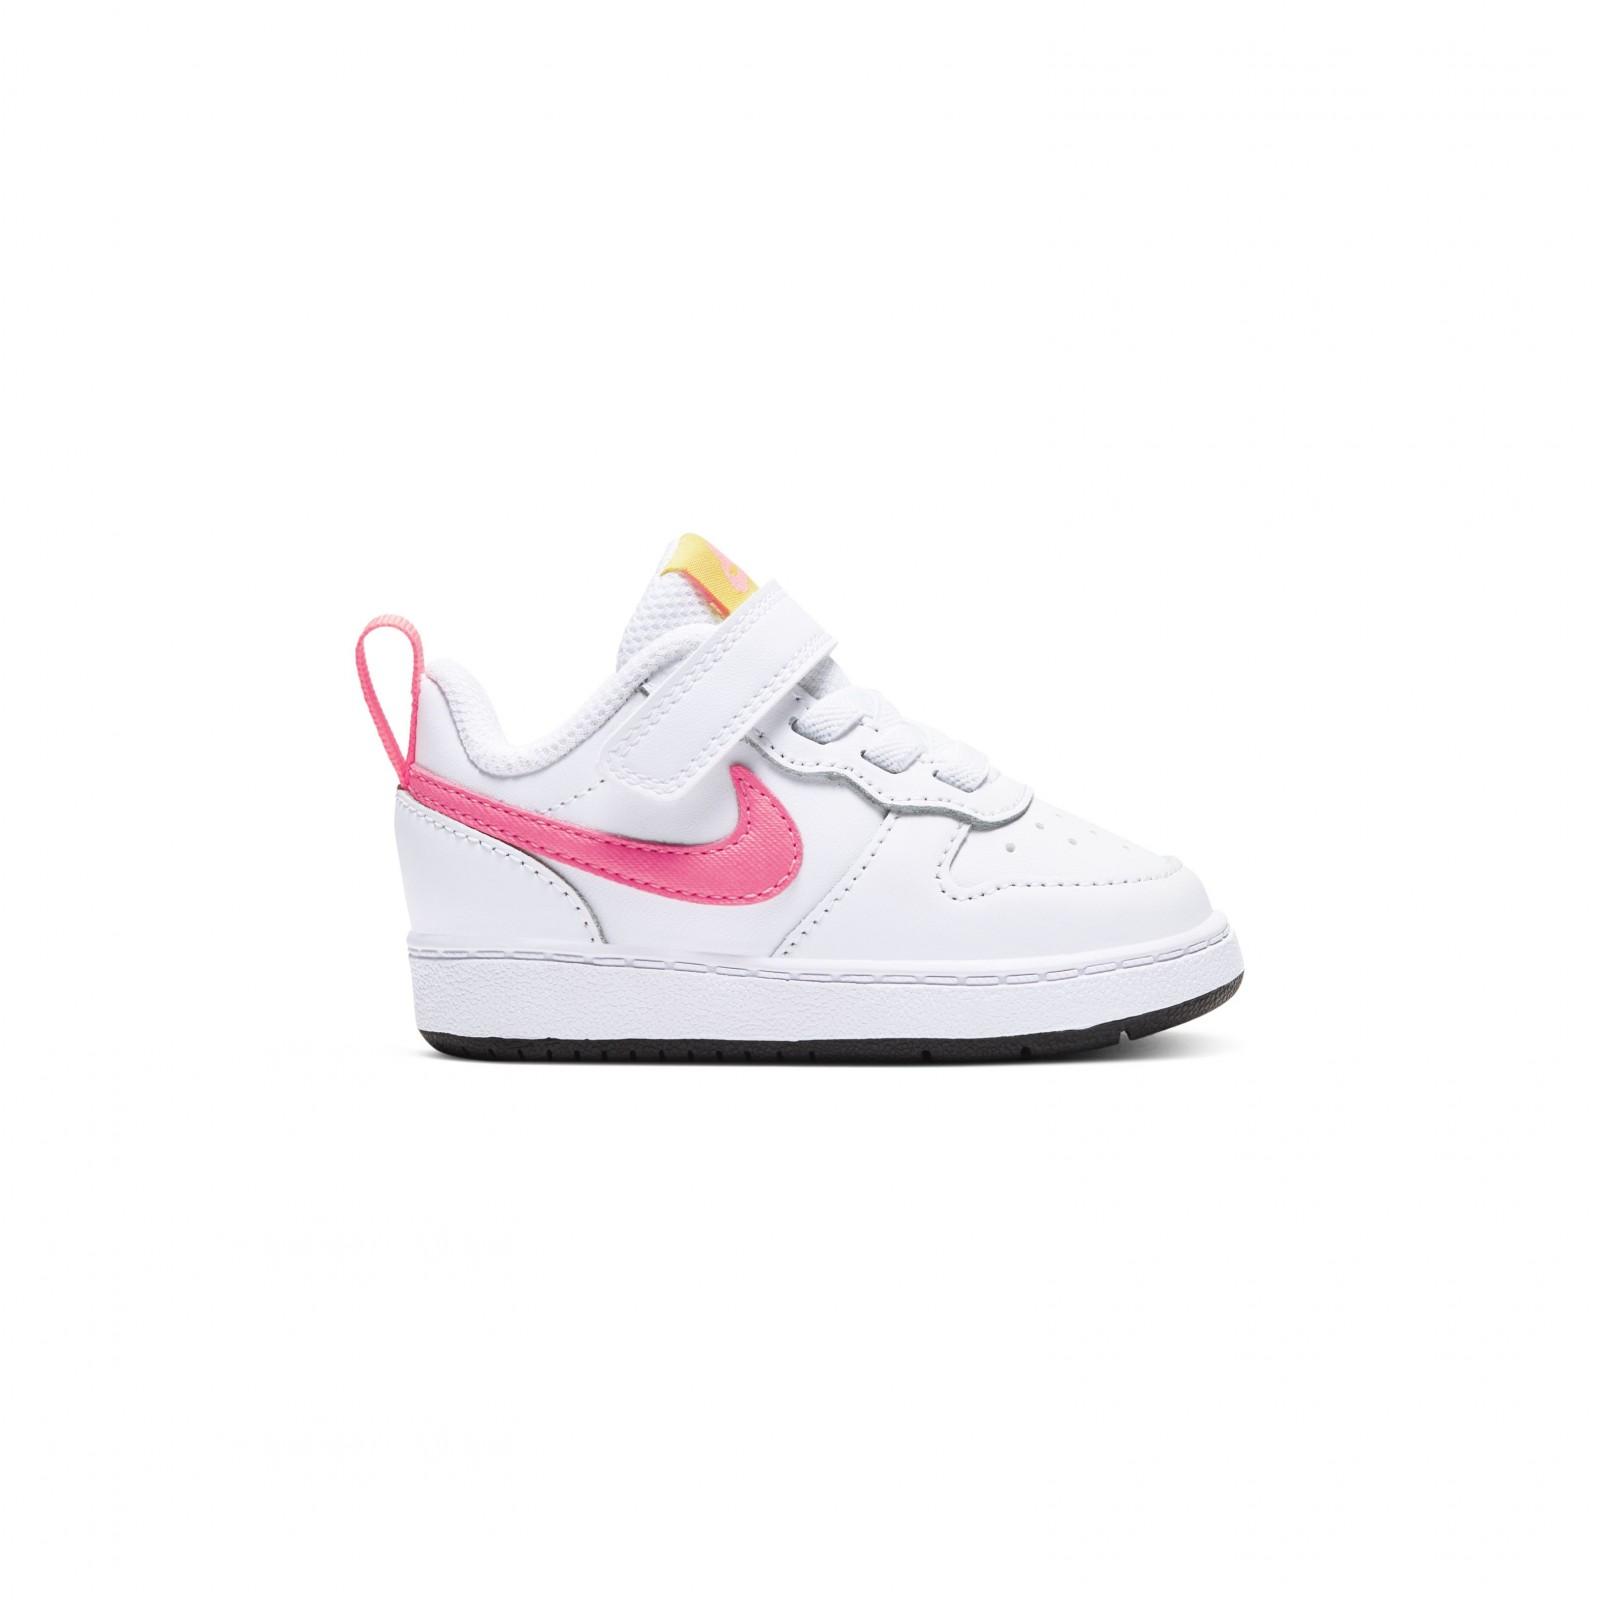 Nike Court Borough Low 2 WHITE/SUNSET PULSE-LT ZITRON-BLACK